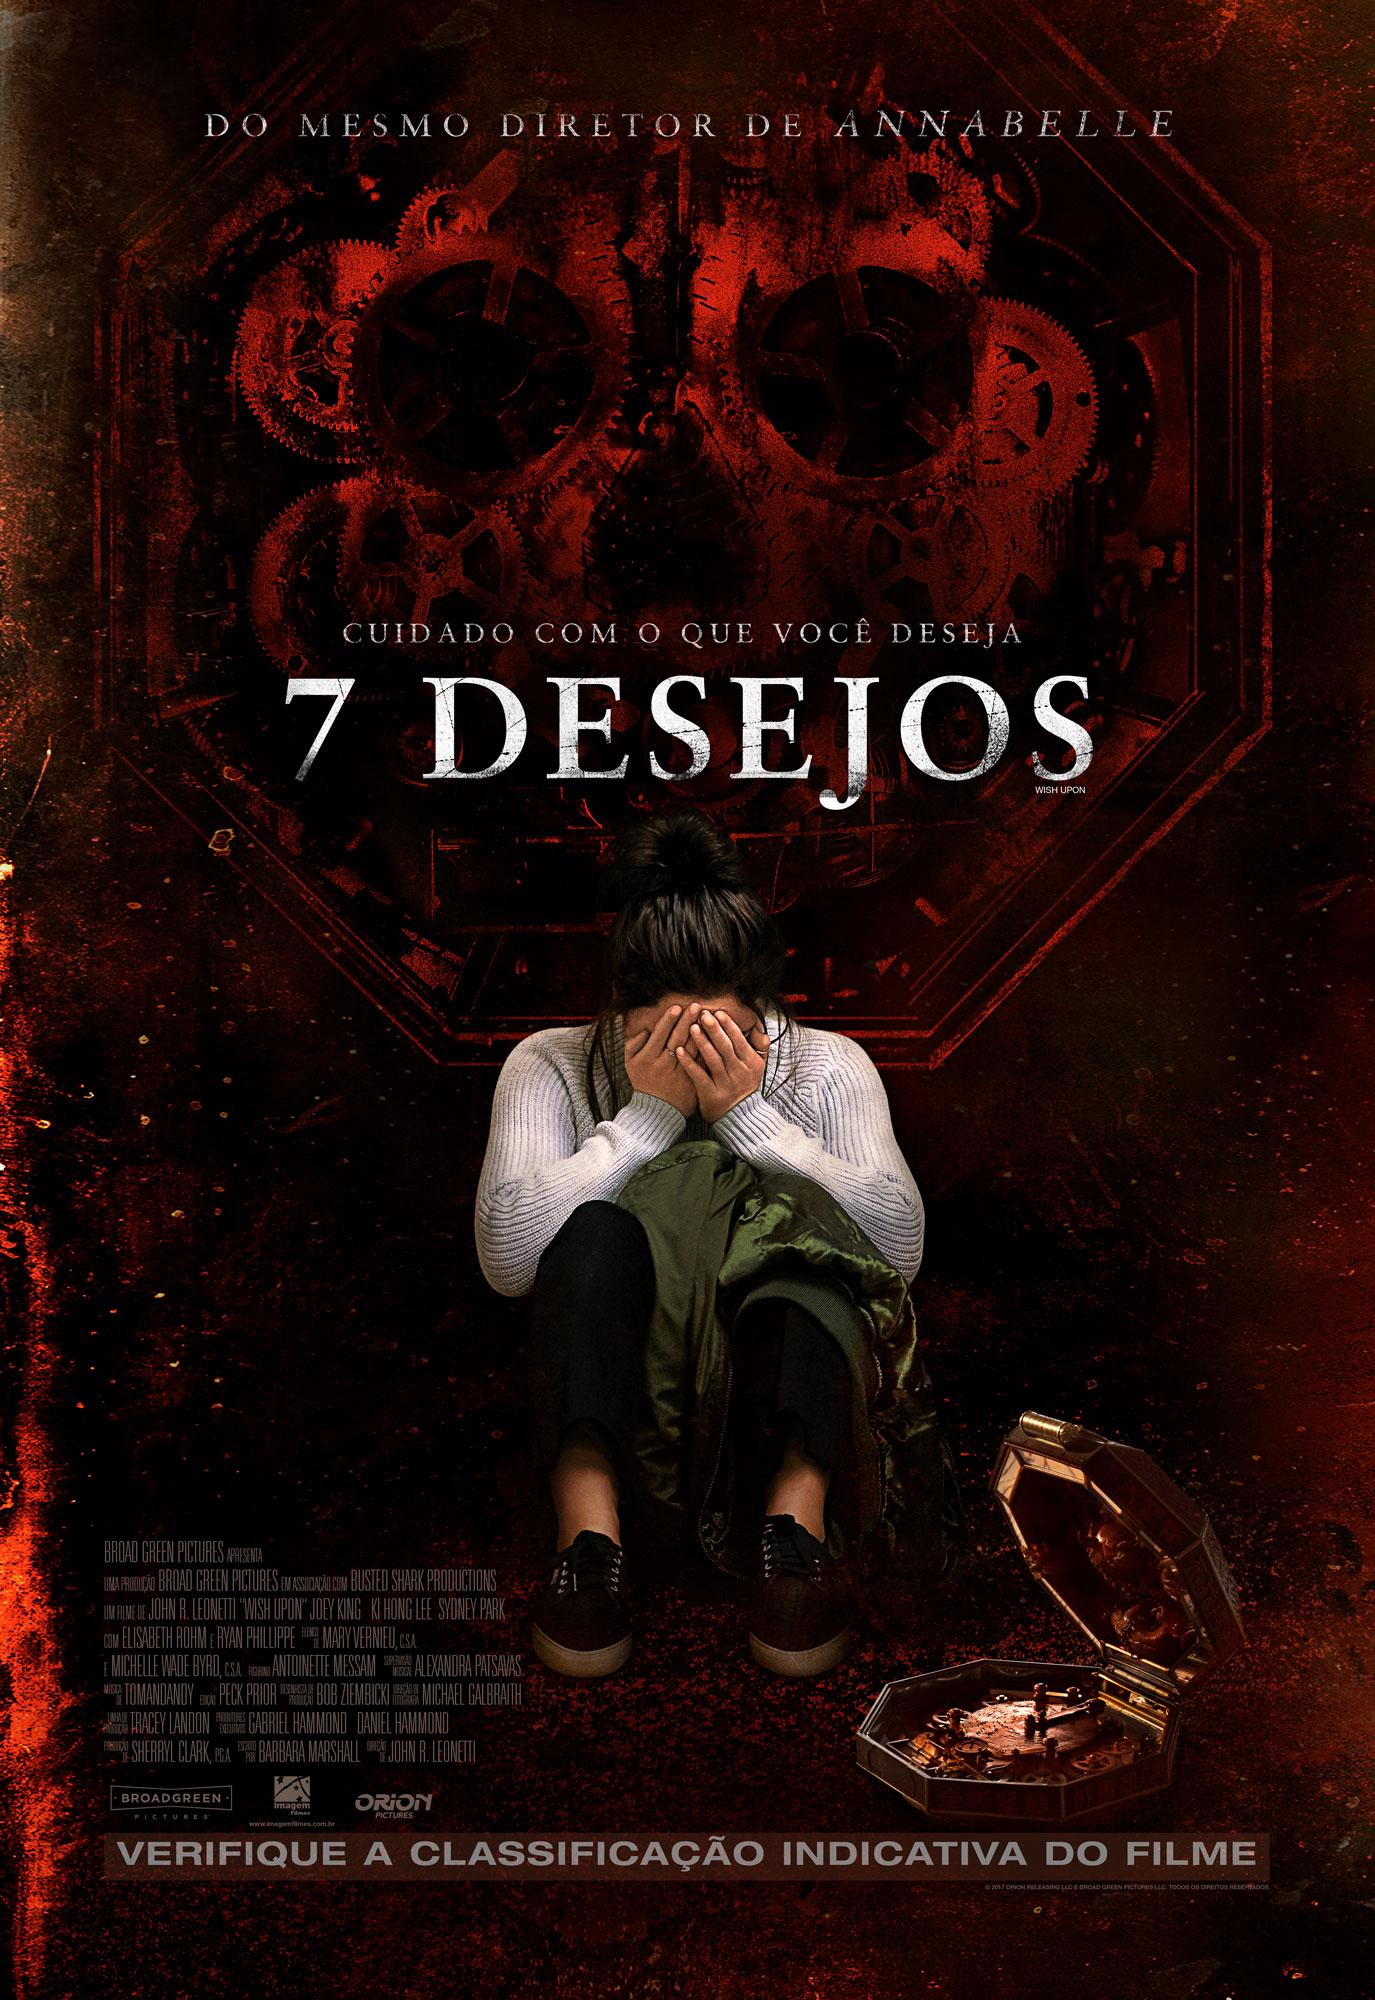 7 Desejos - Filme 2017 - AdoroCinema